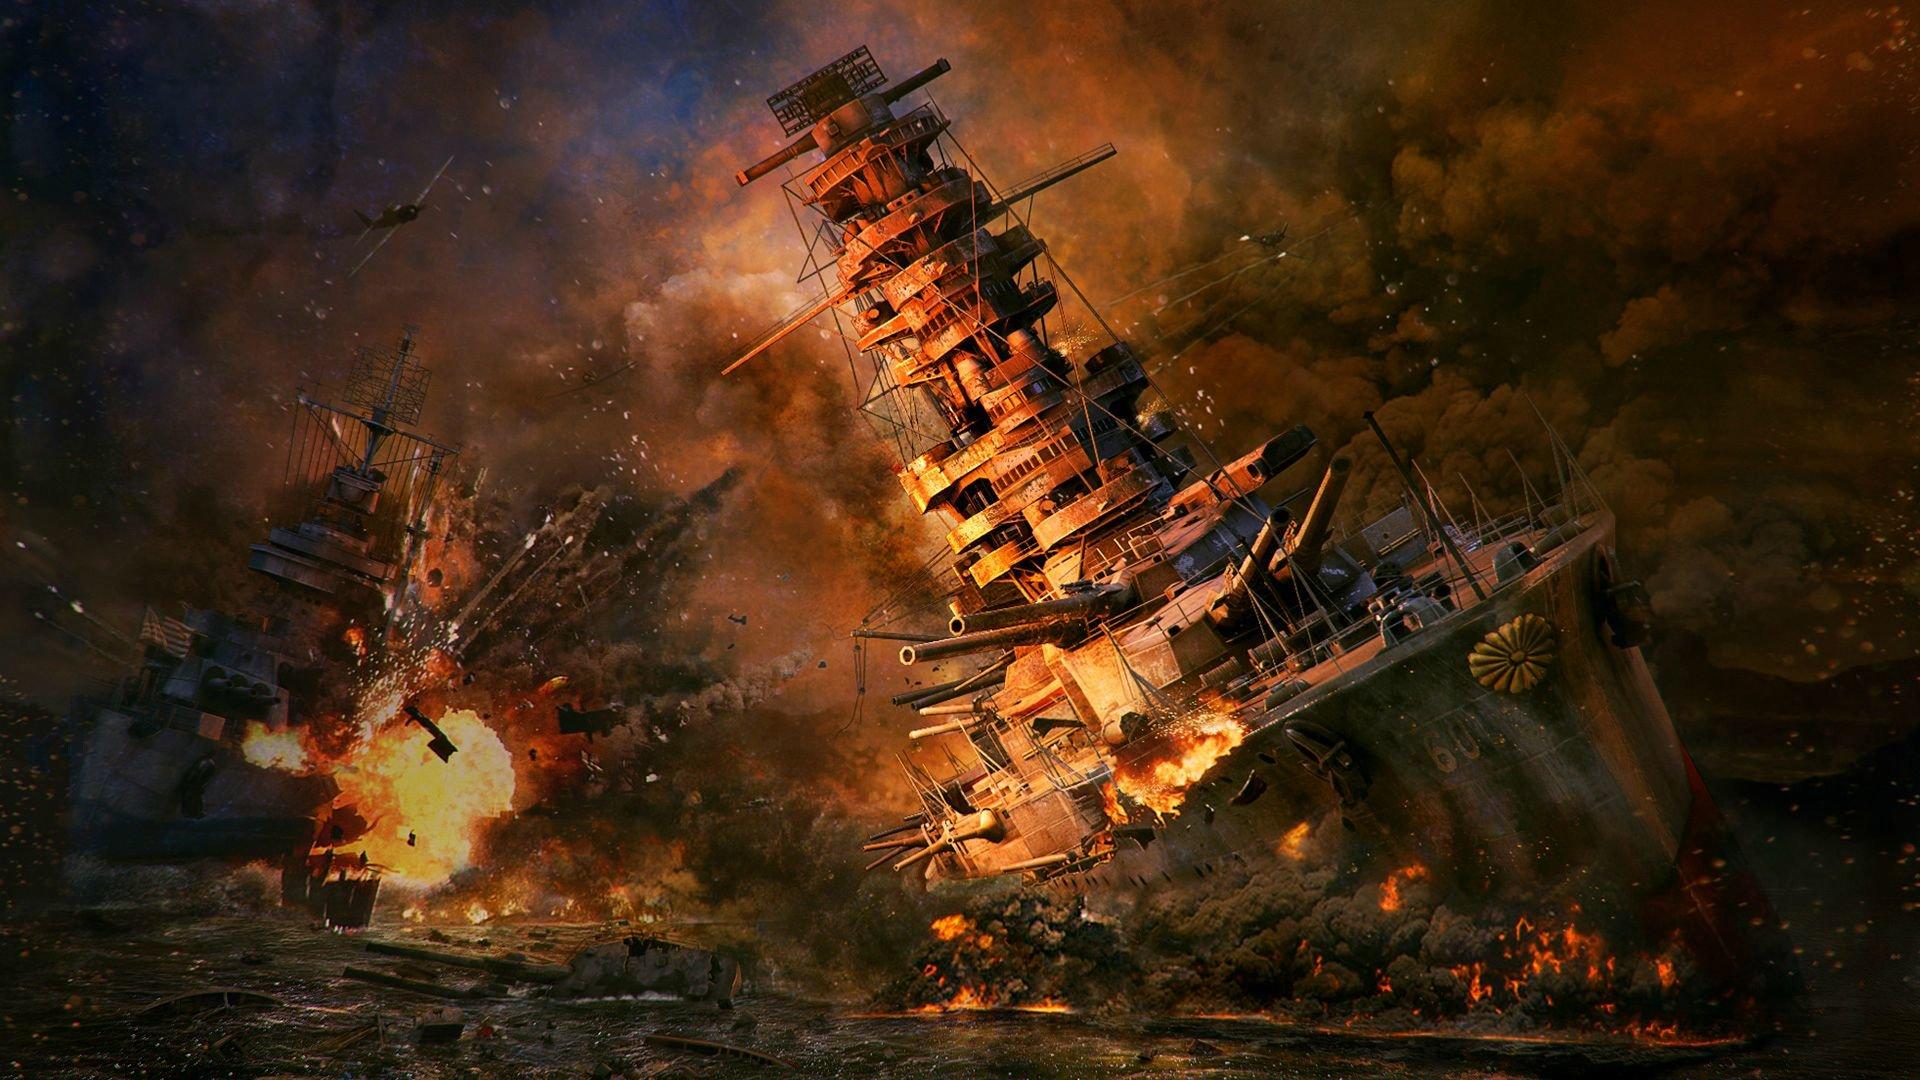 world-of-warships-wallpaper-full-hd-1080p-69332